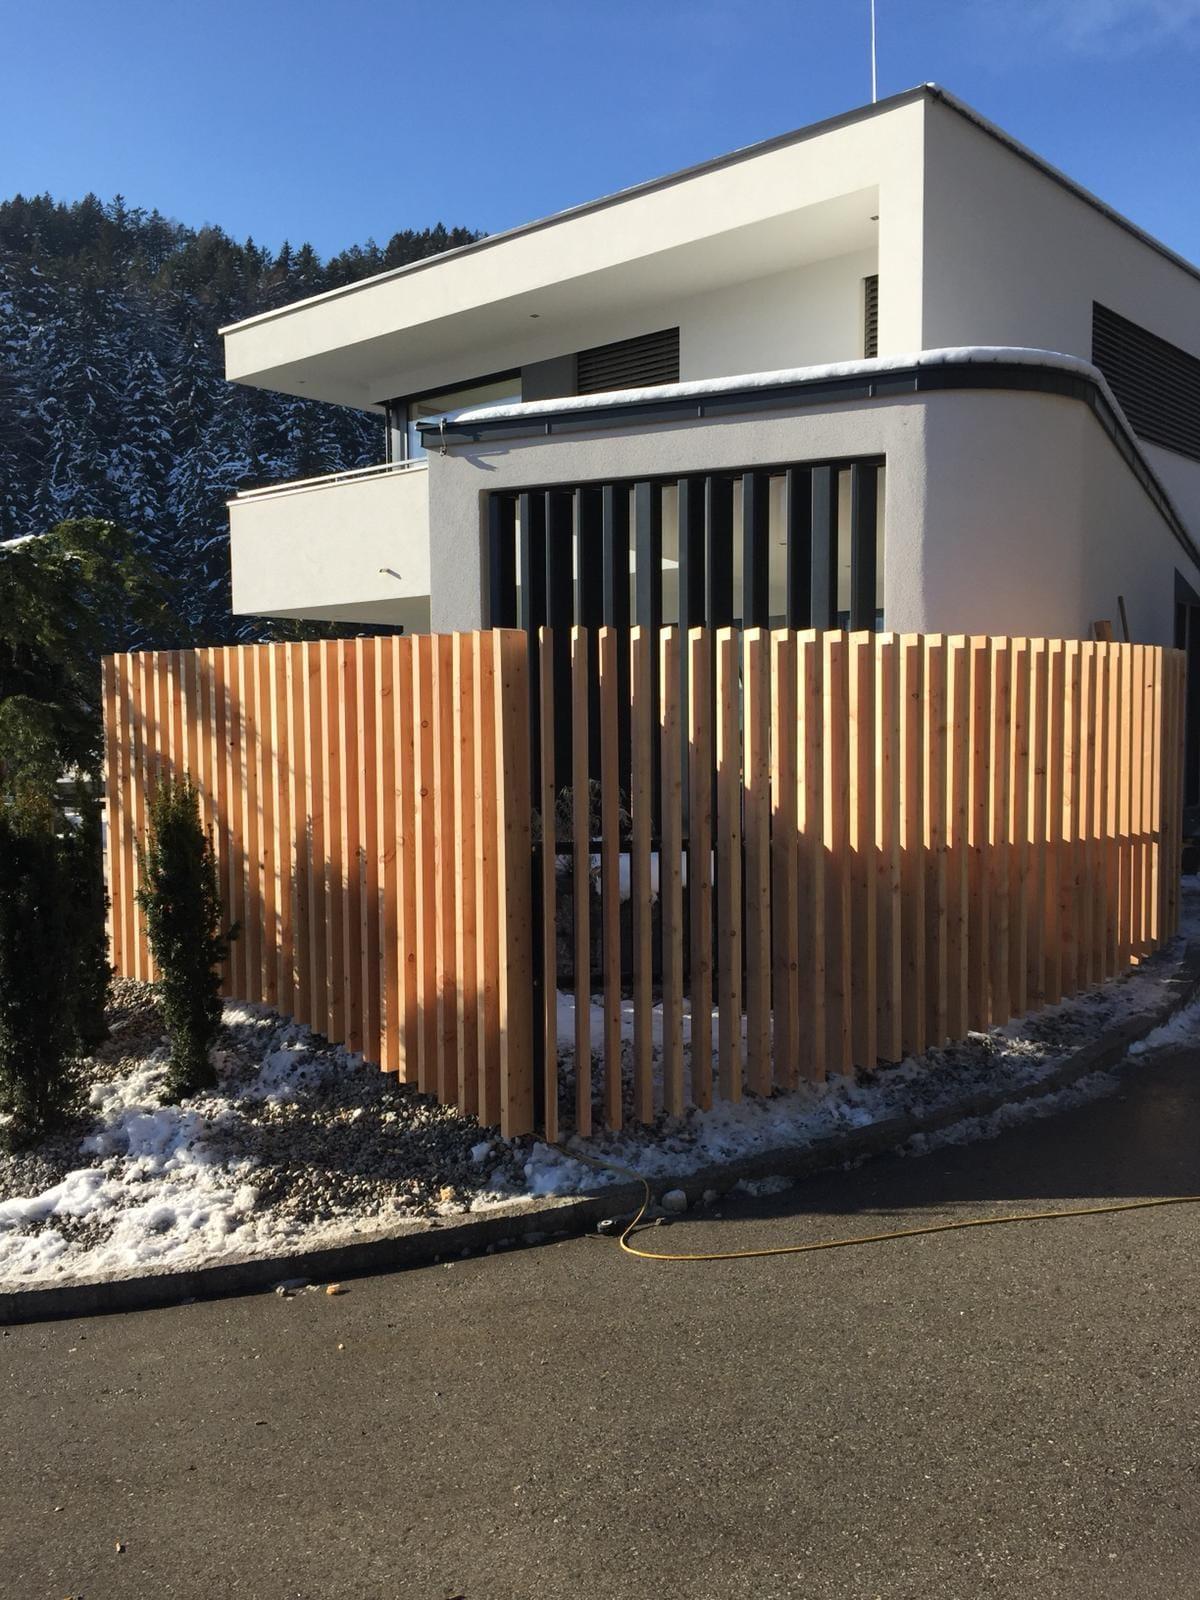 19-Holz-Zaun-2018-Norz-Thaur.JPG